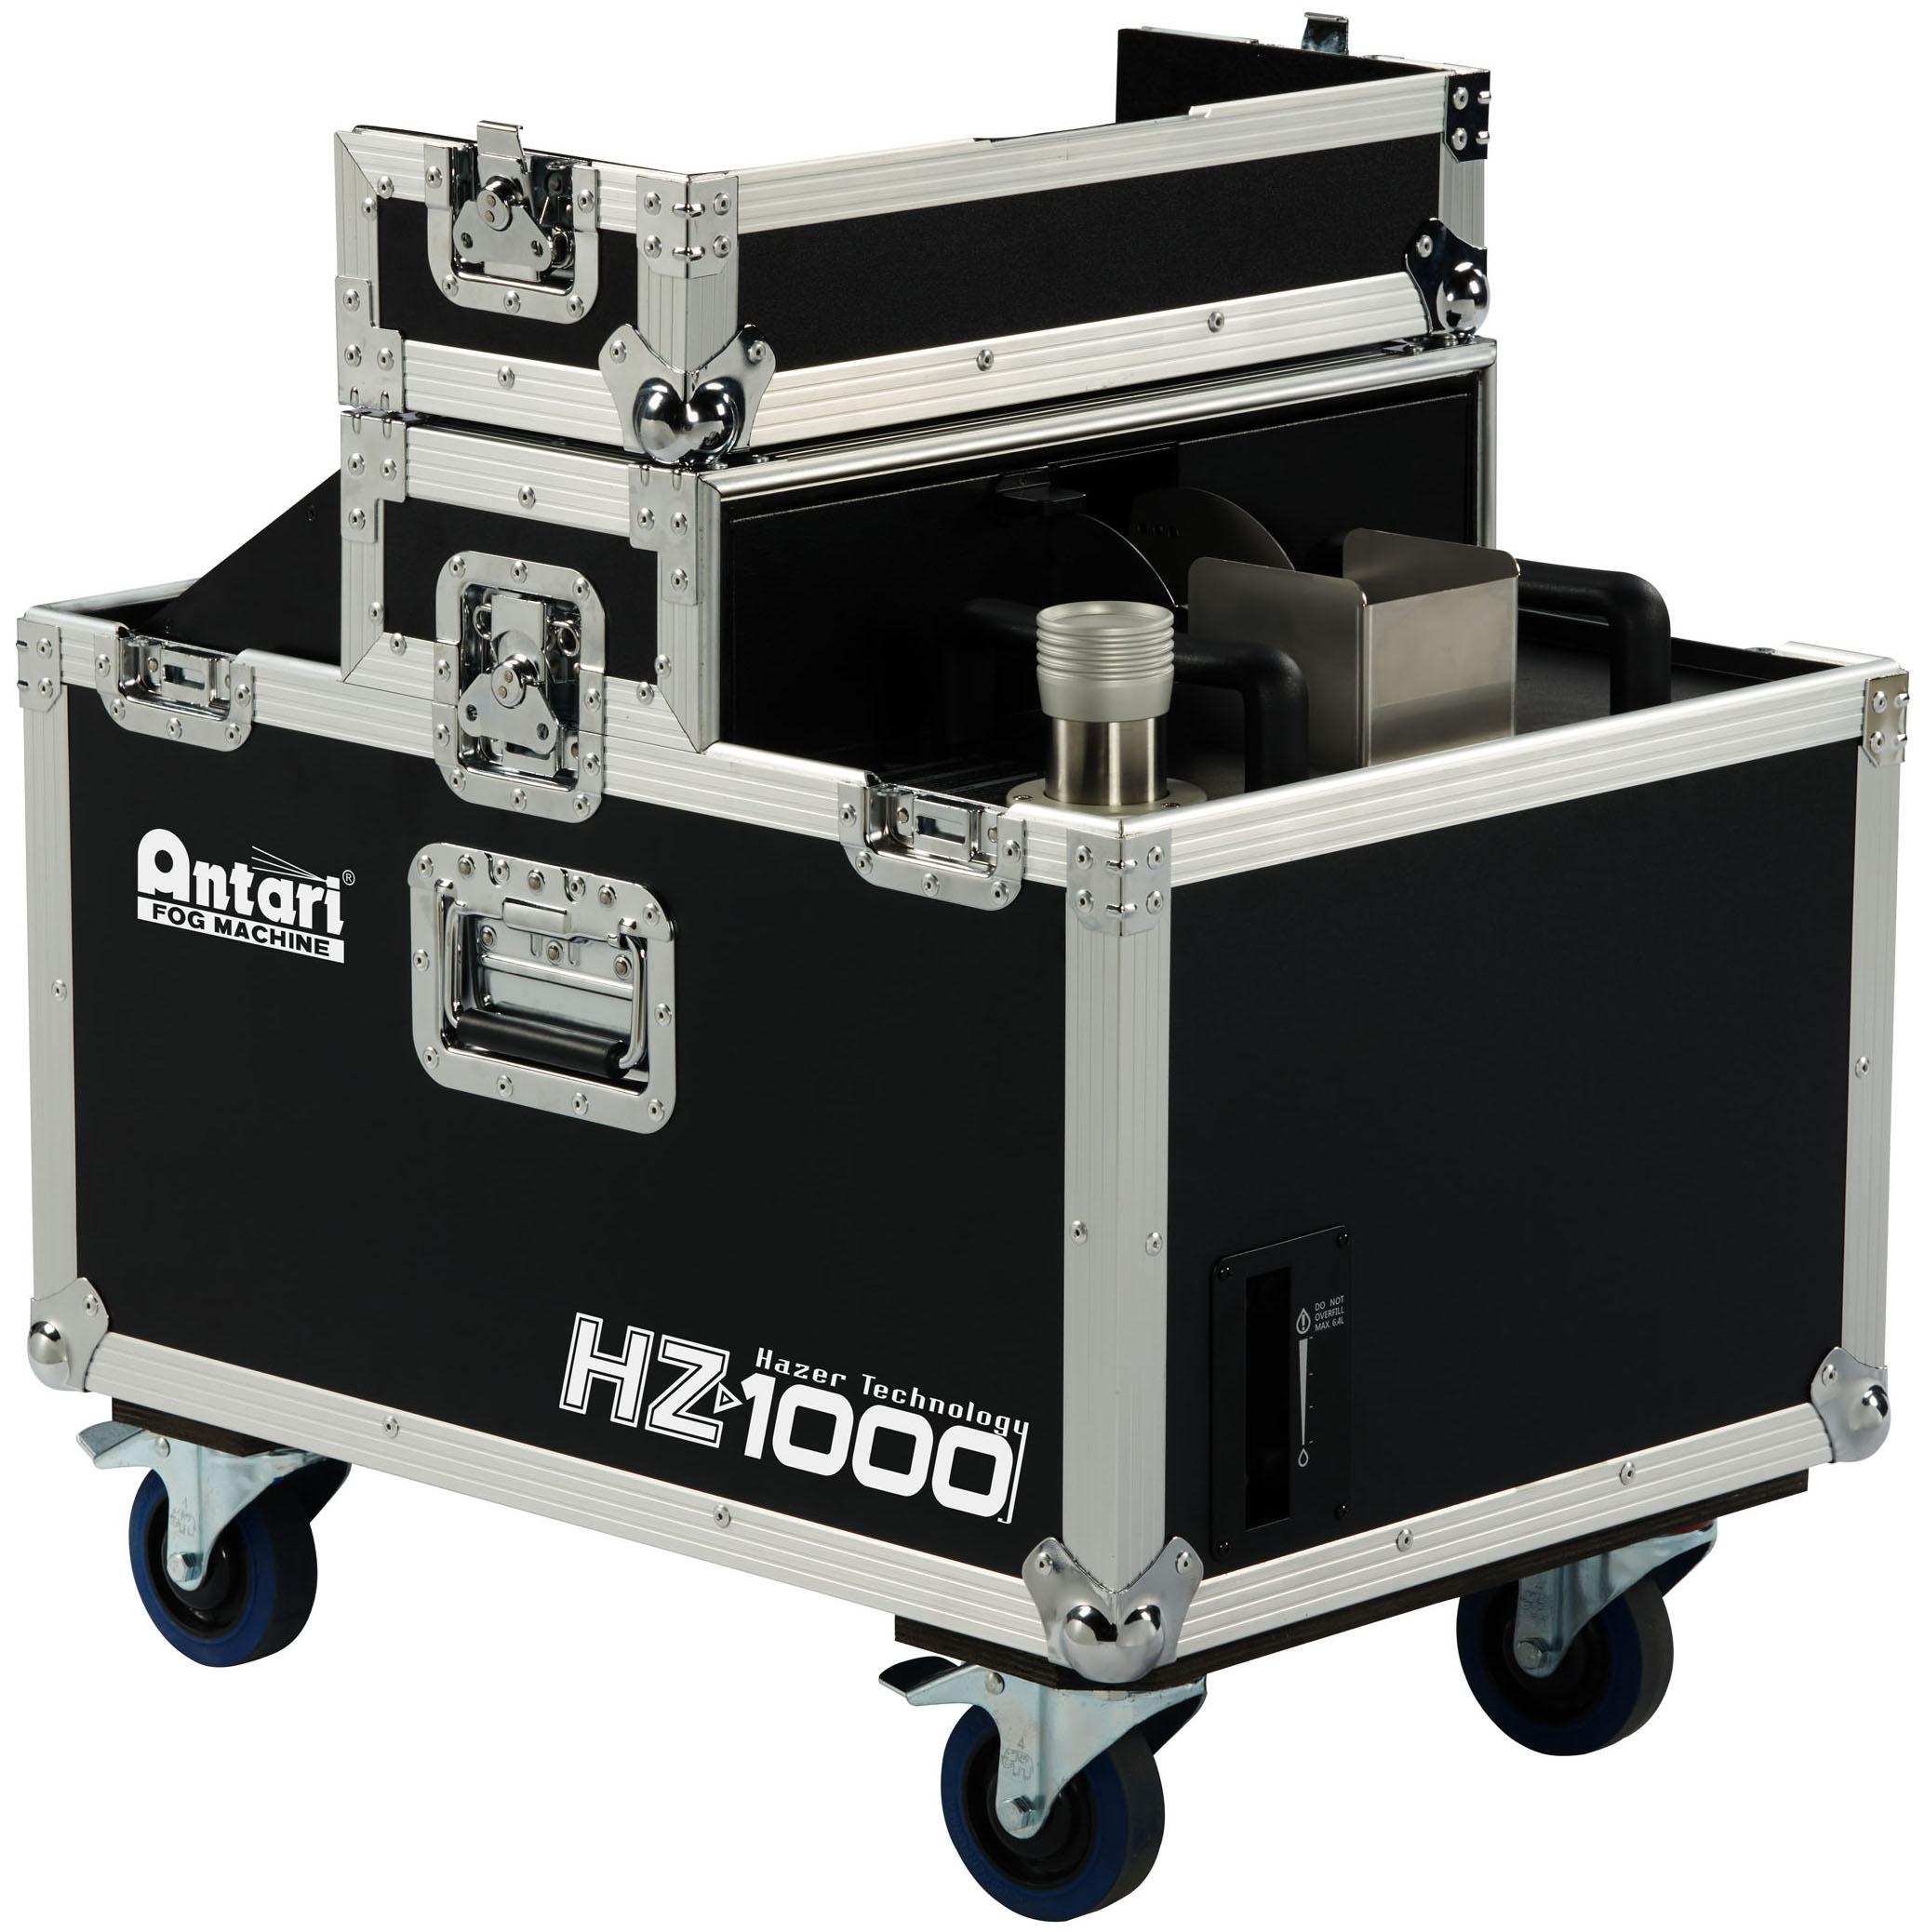 ANTARI HZ-1000 is the most advanced haze machine among AntariÔÇÖs HZ series.